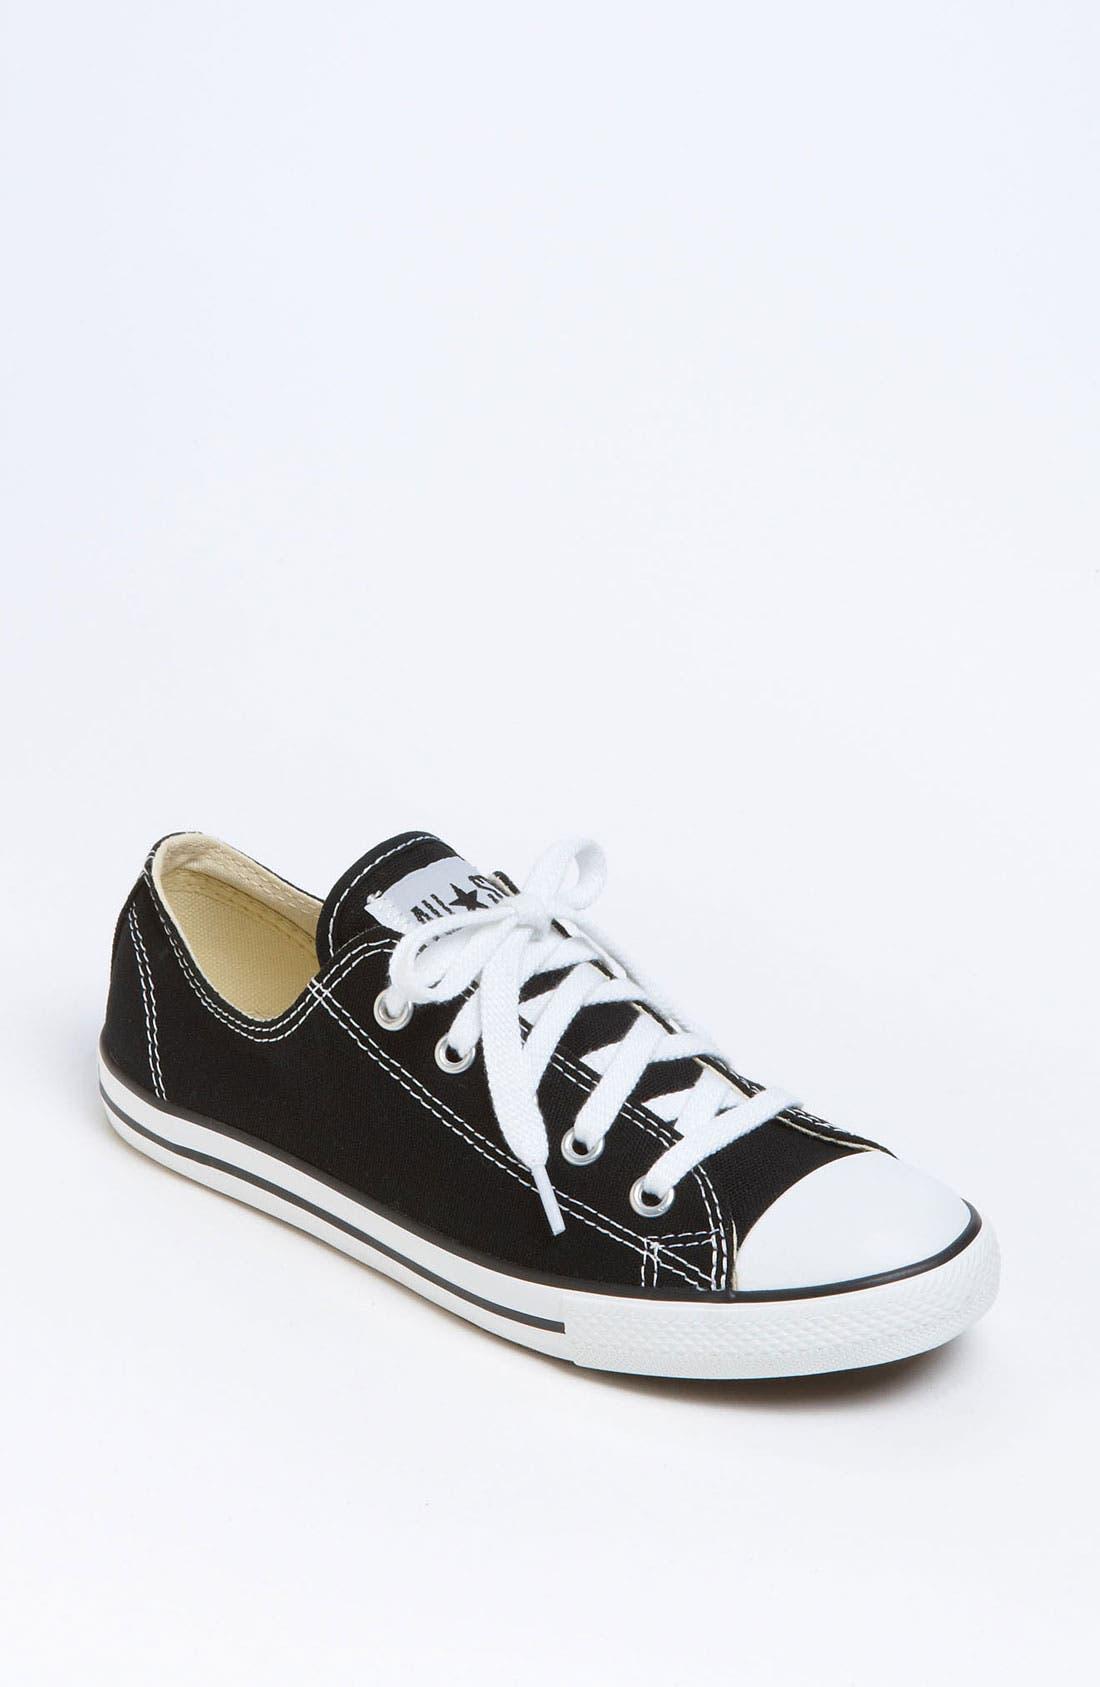 CONVERSE Chuck Taylor<sup>®</sup> 'Dainty' Sneaker, Main, color, 001